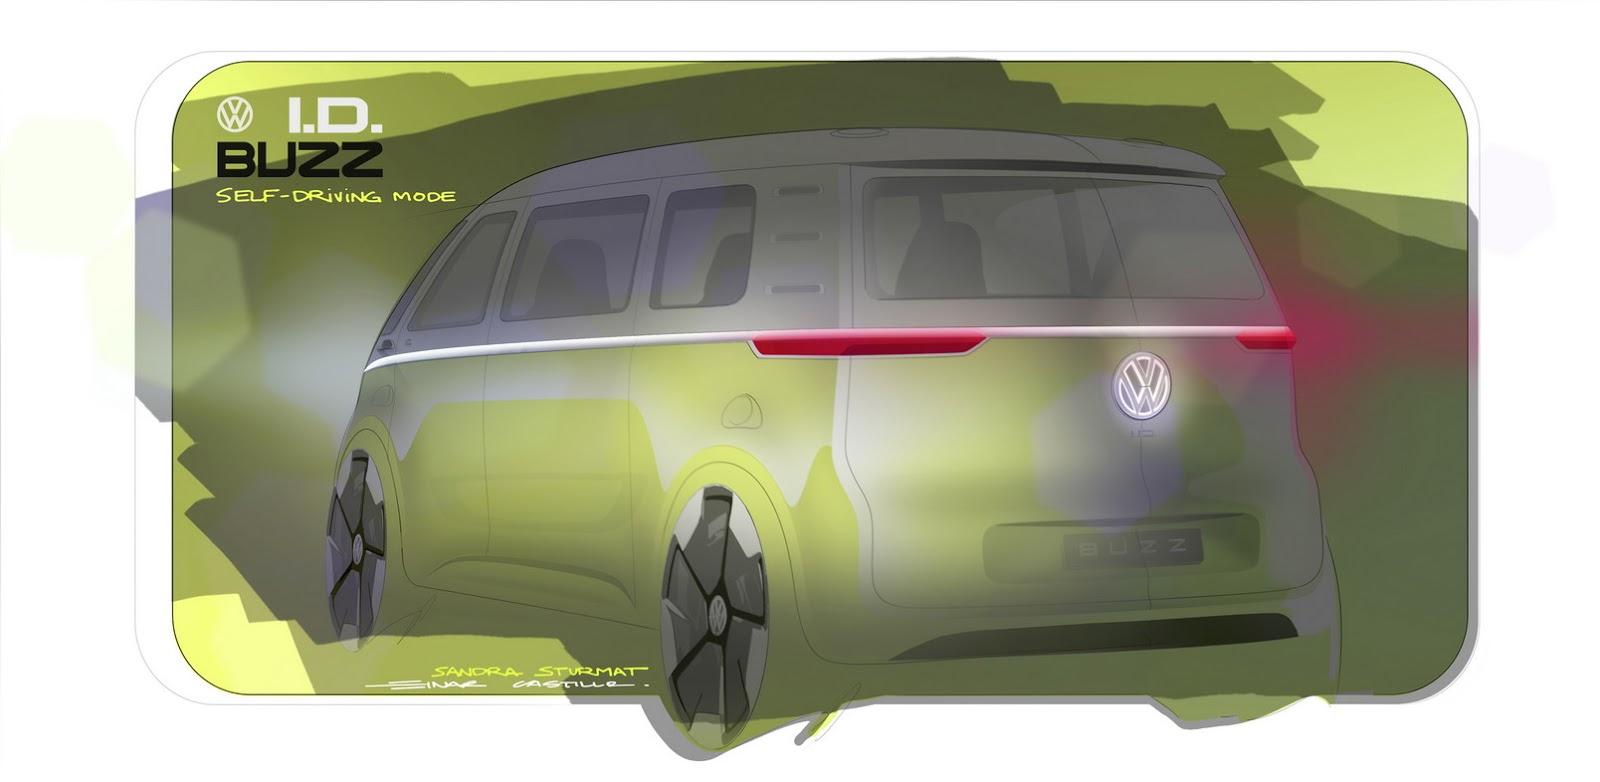 Volkswagen I.D. Buzz Concept (56)